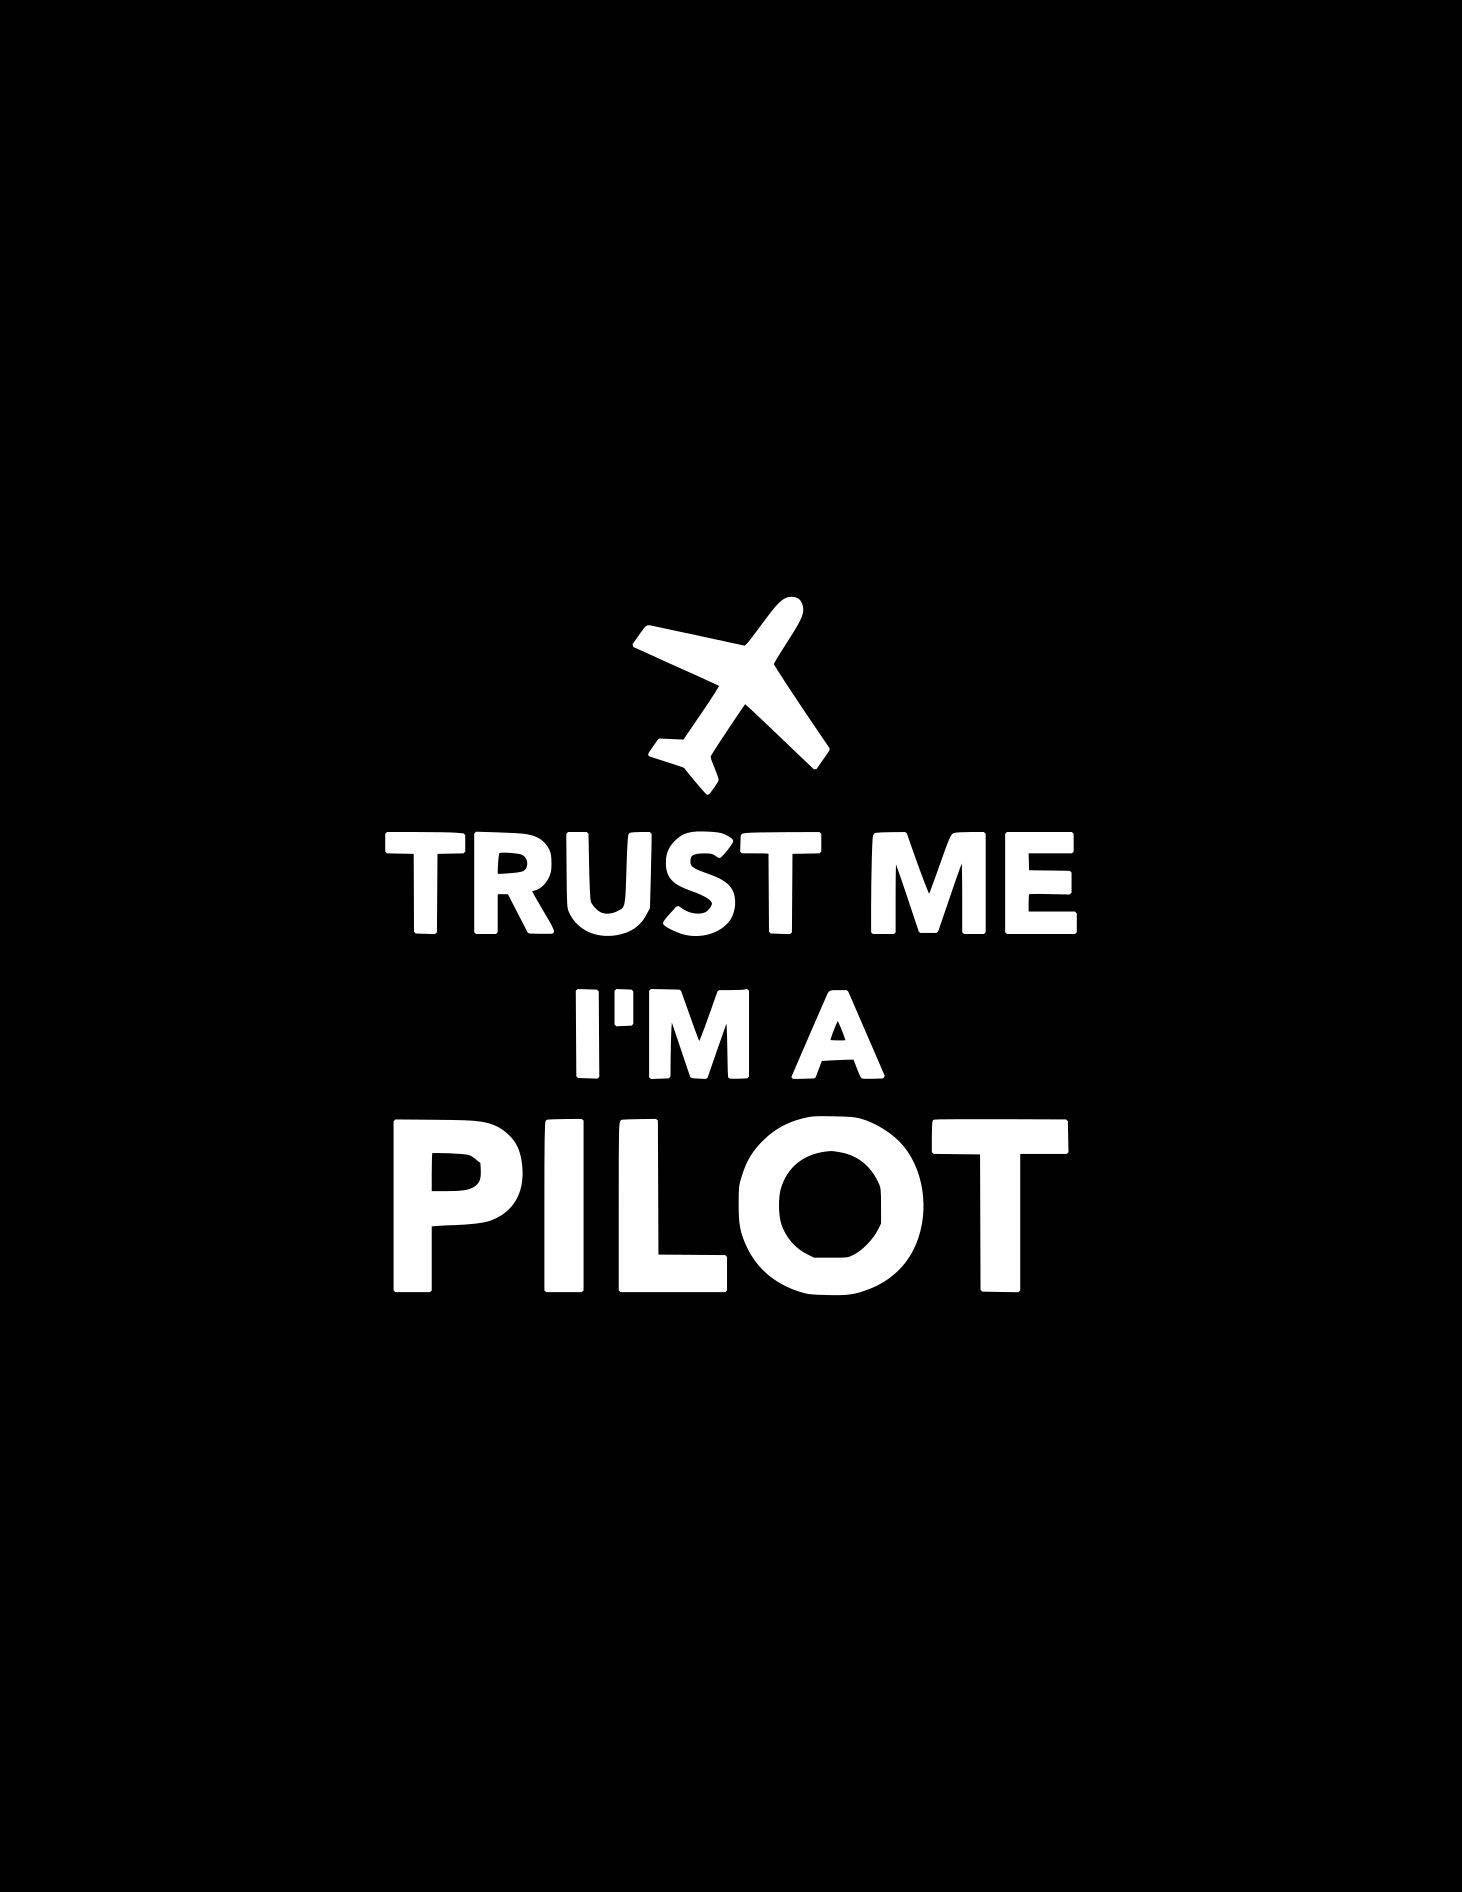 Pilot Decal Trust Me I M A Pilot Sticker Vinyl Decal Car Decal Travel Car Decals Aviation Car Decal Laptop Yeti Bumper Sticker Laptop Tablet [ 1892 x 1462 Pixel ]